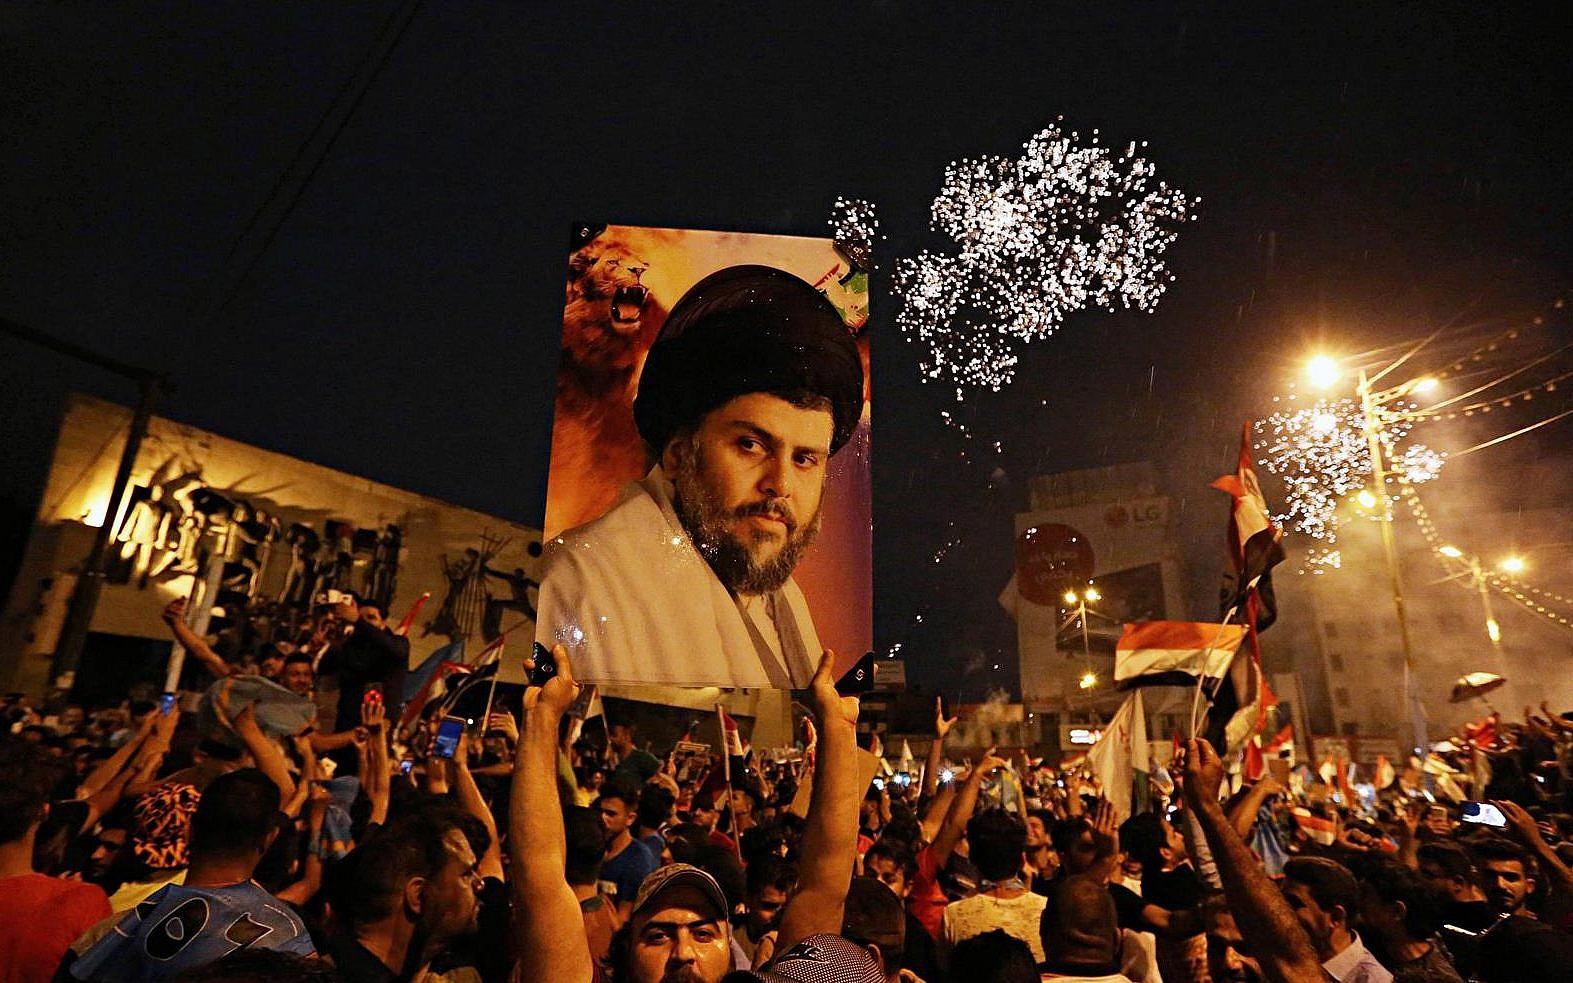 Iraq's election winner al-Sadr, promising reform, is ...